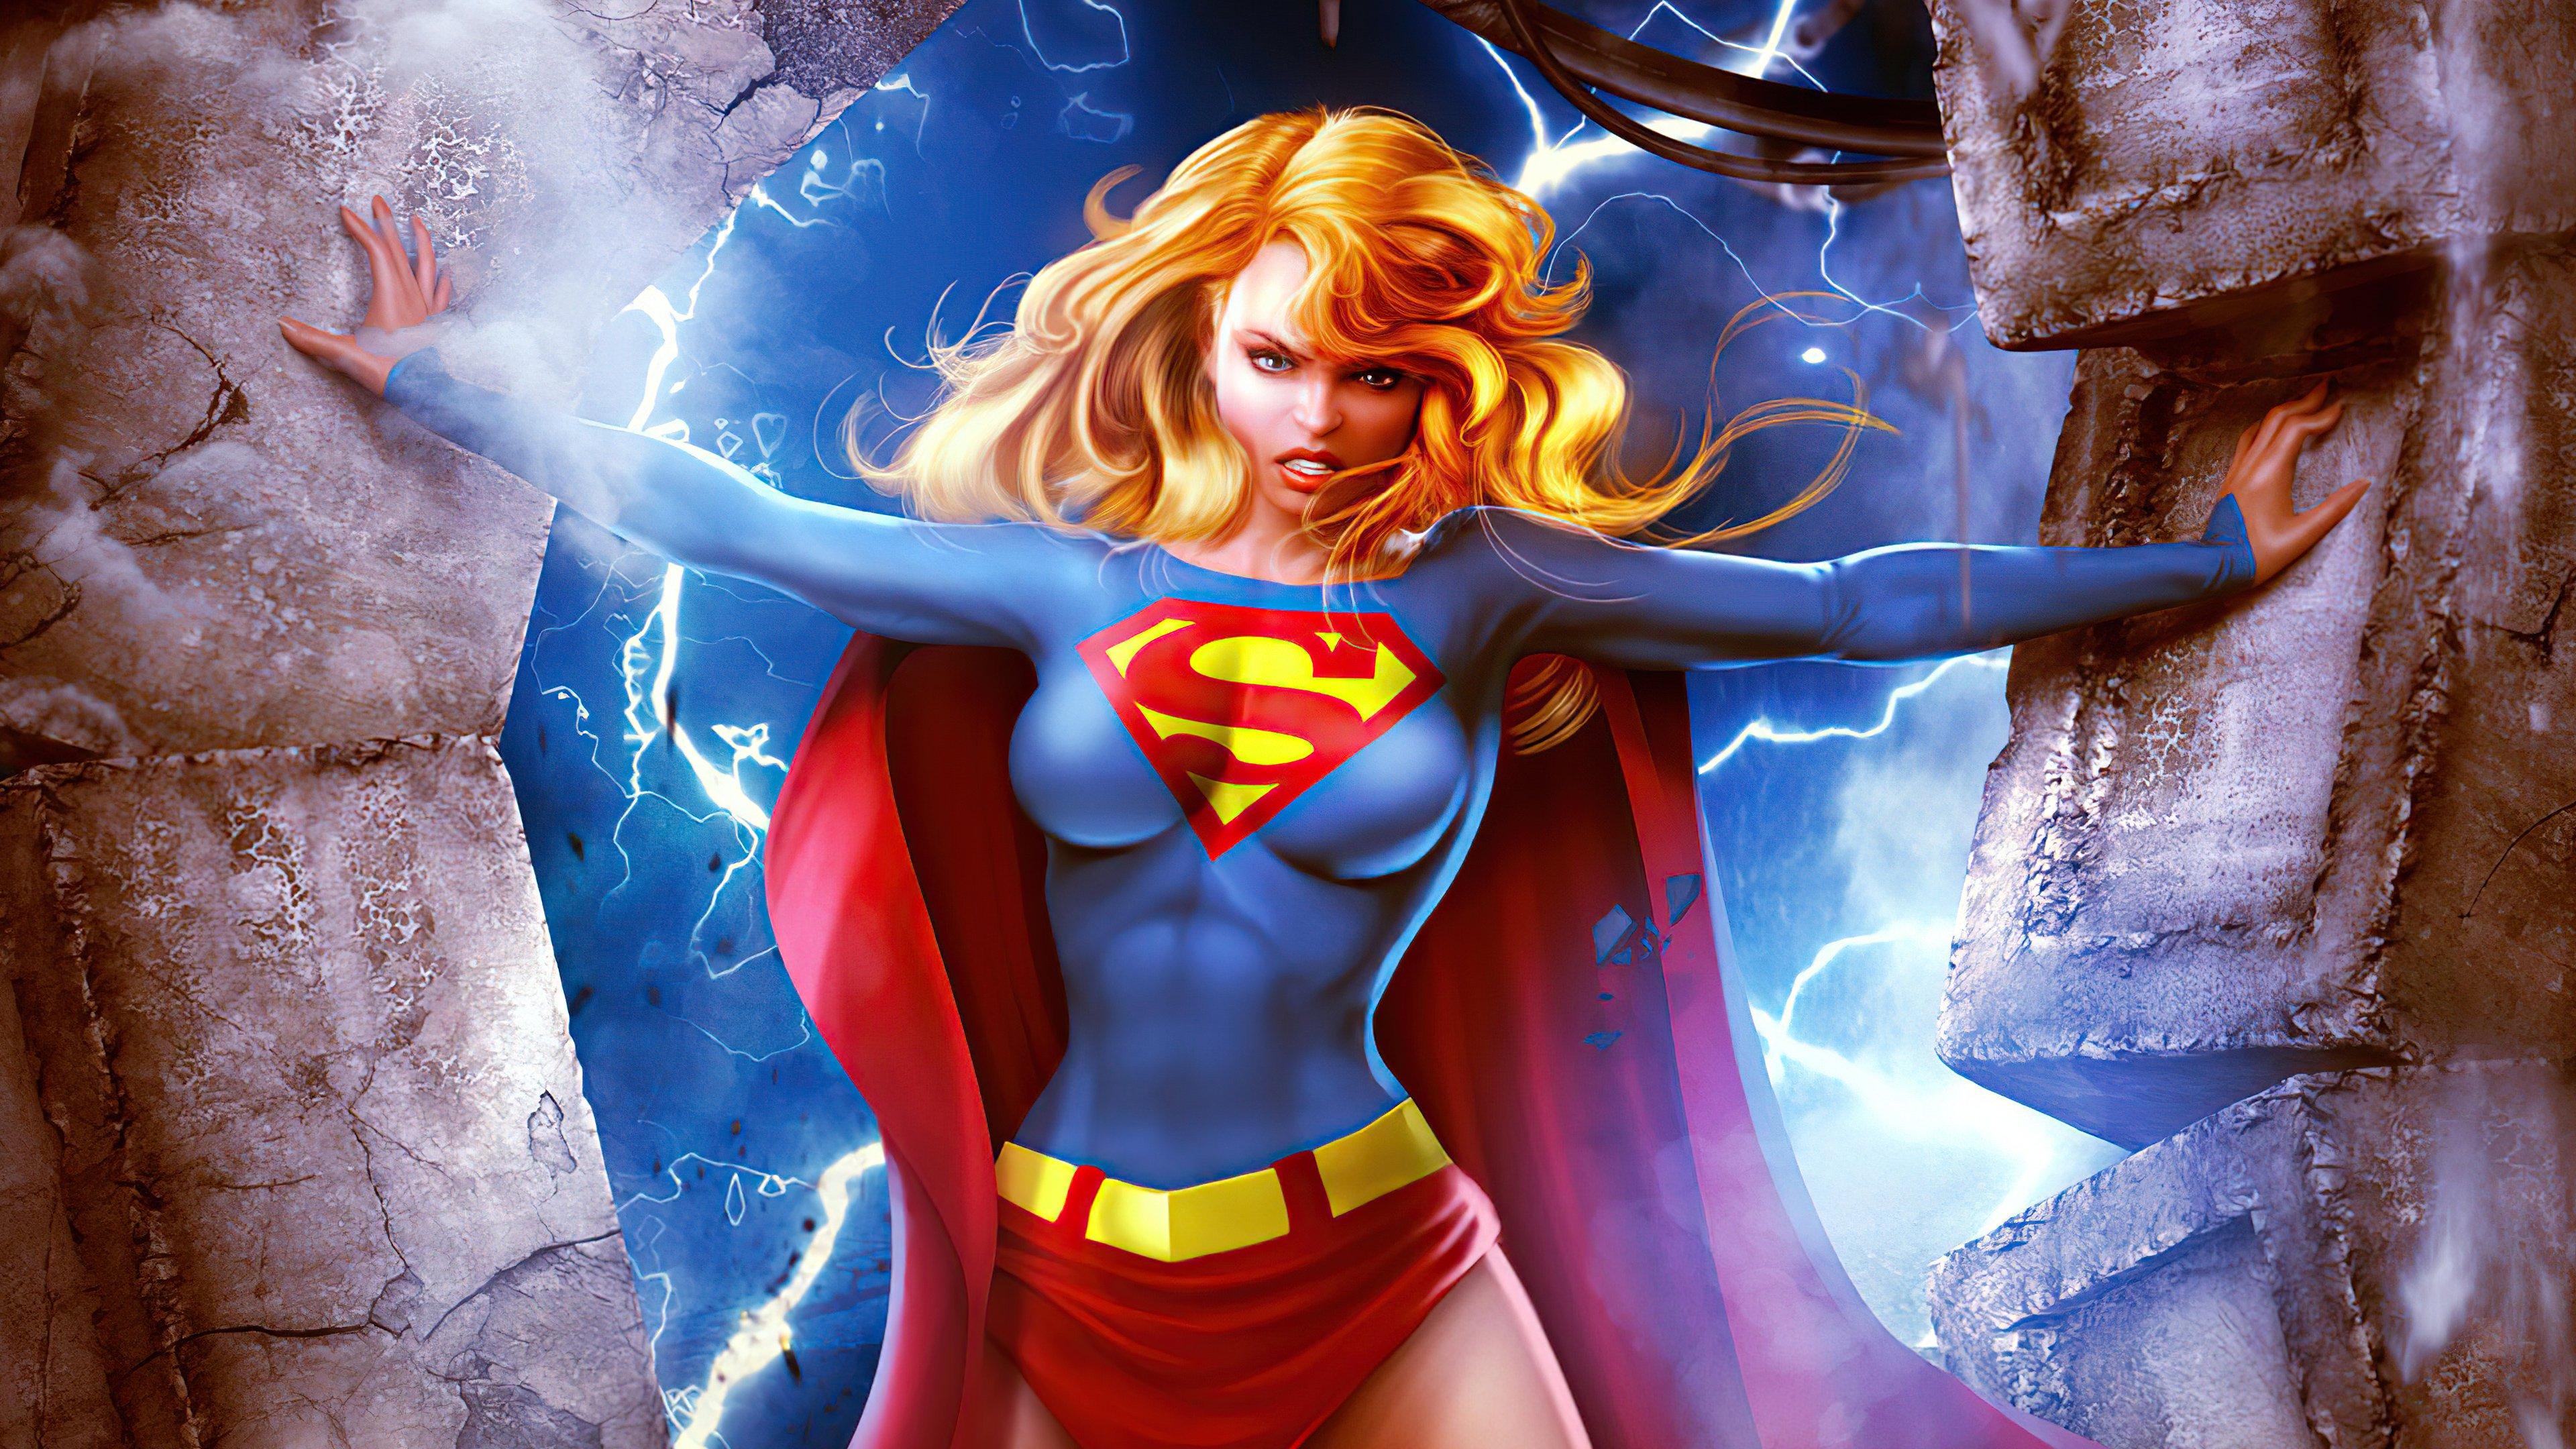 Wallpaper Supergirl Superhero Fanart